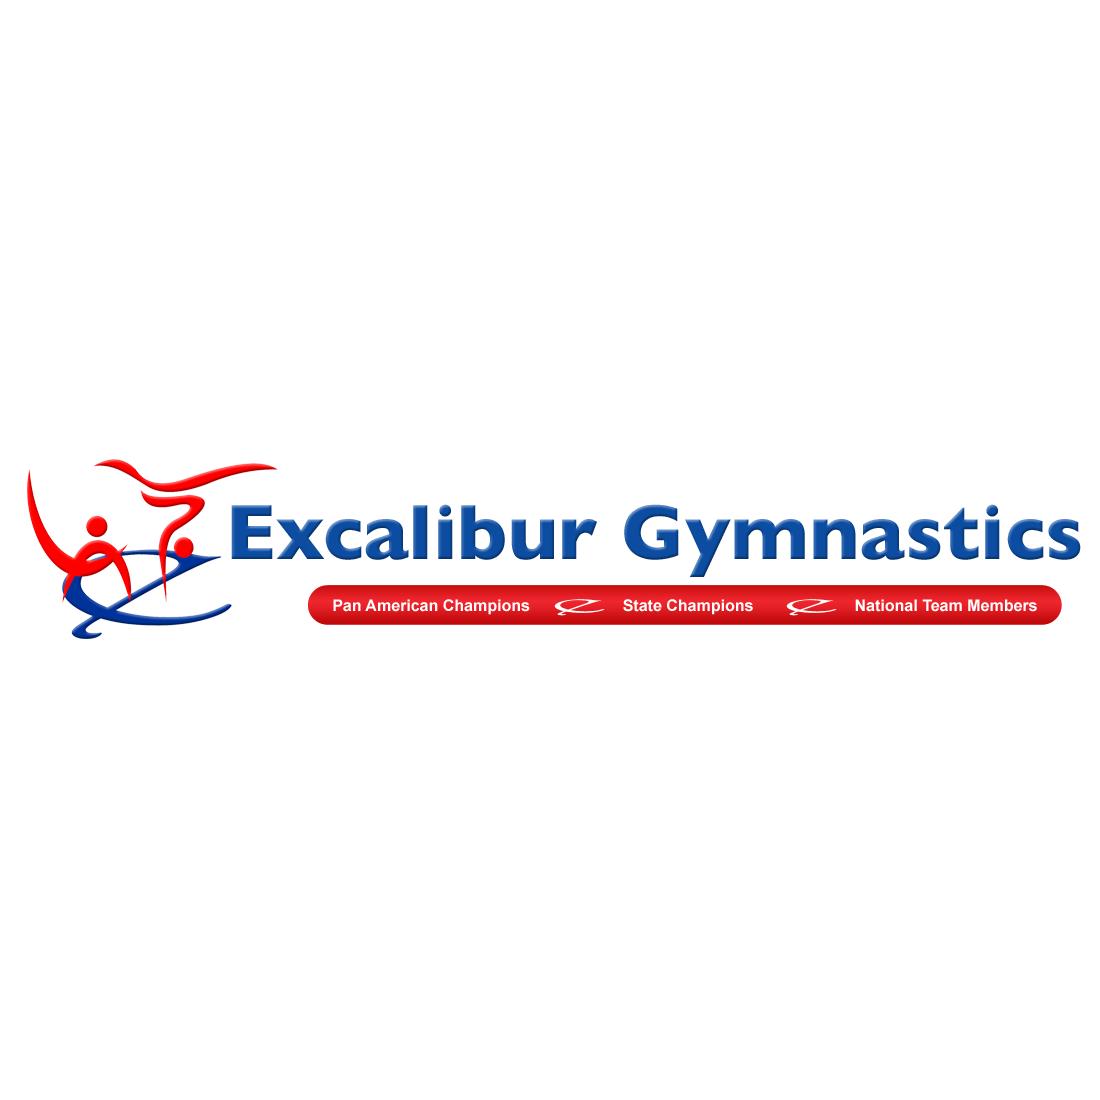 Excalibur Gymnastics